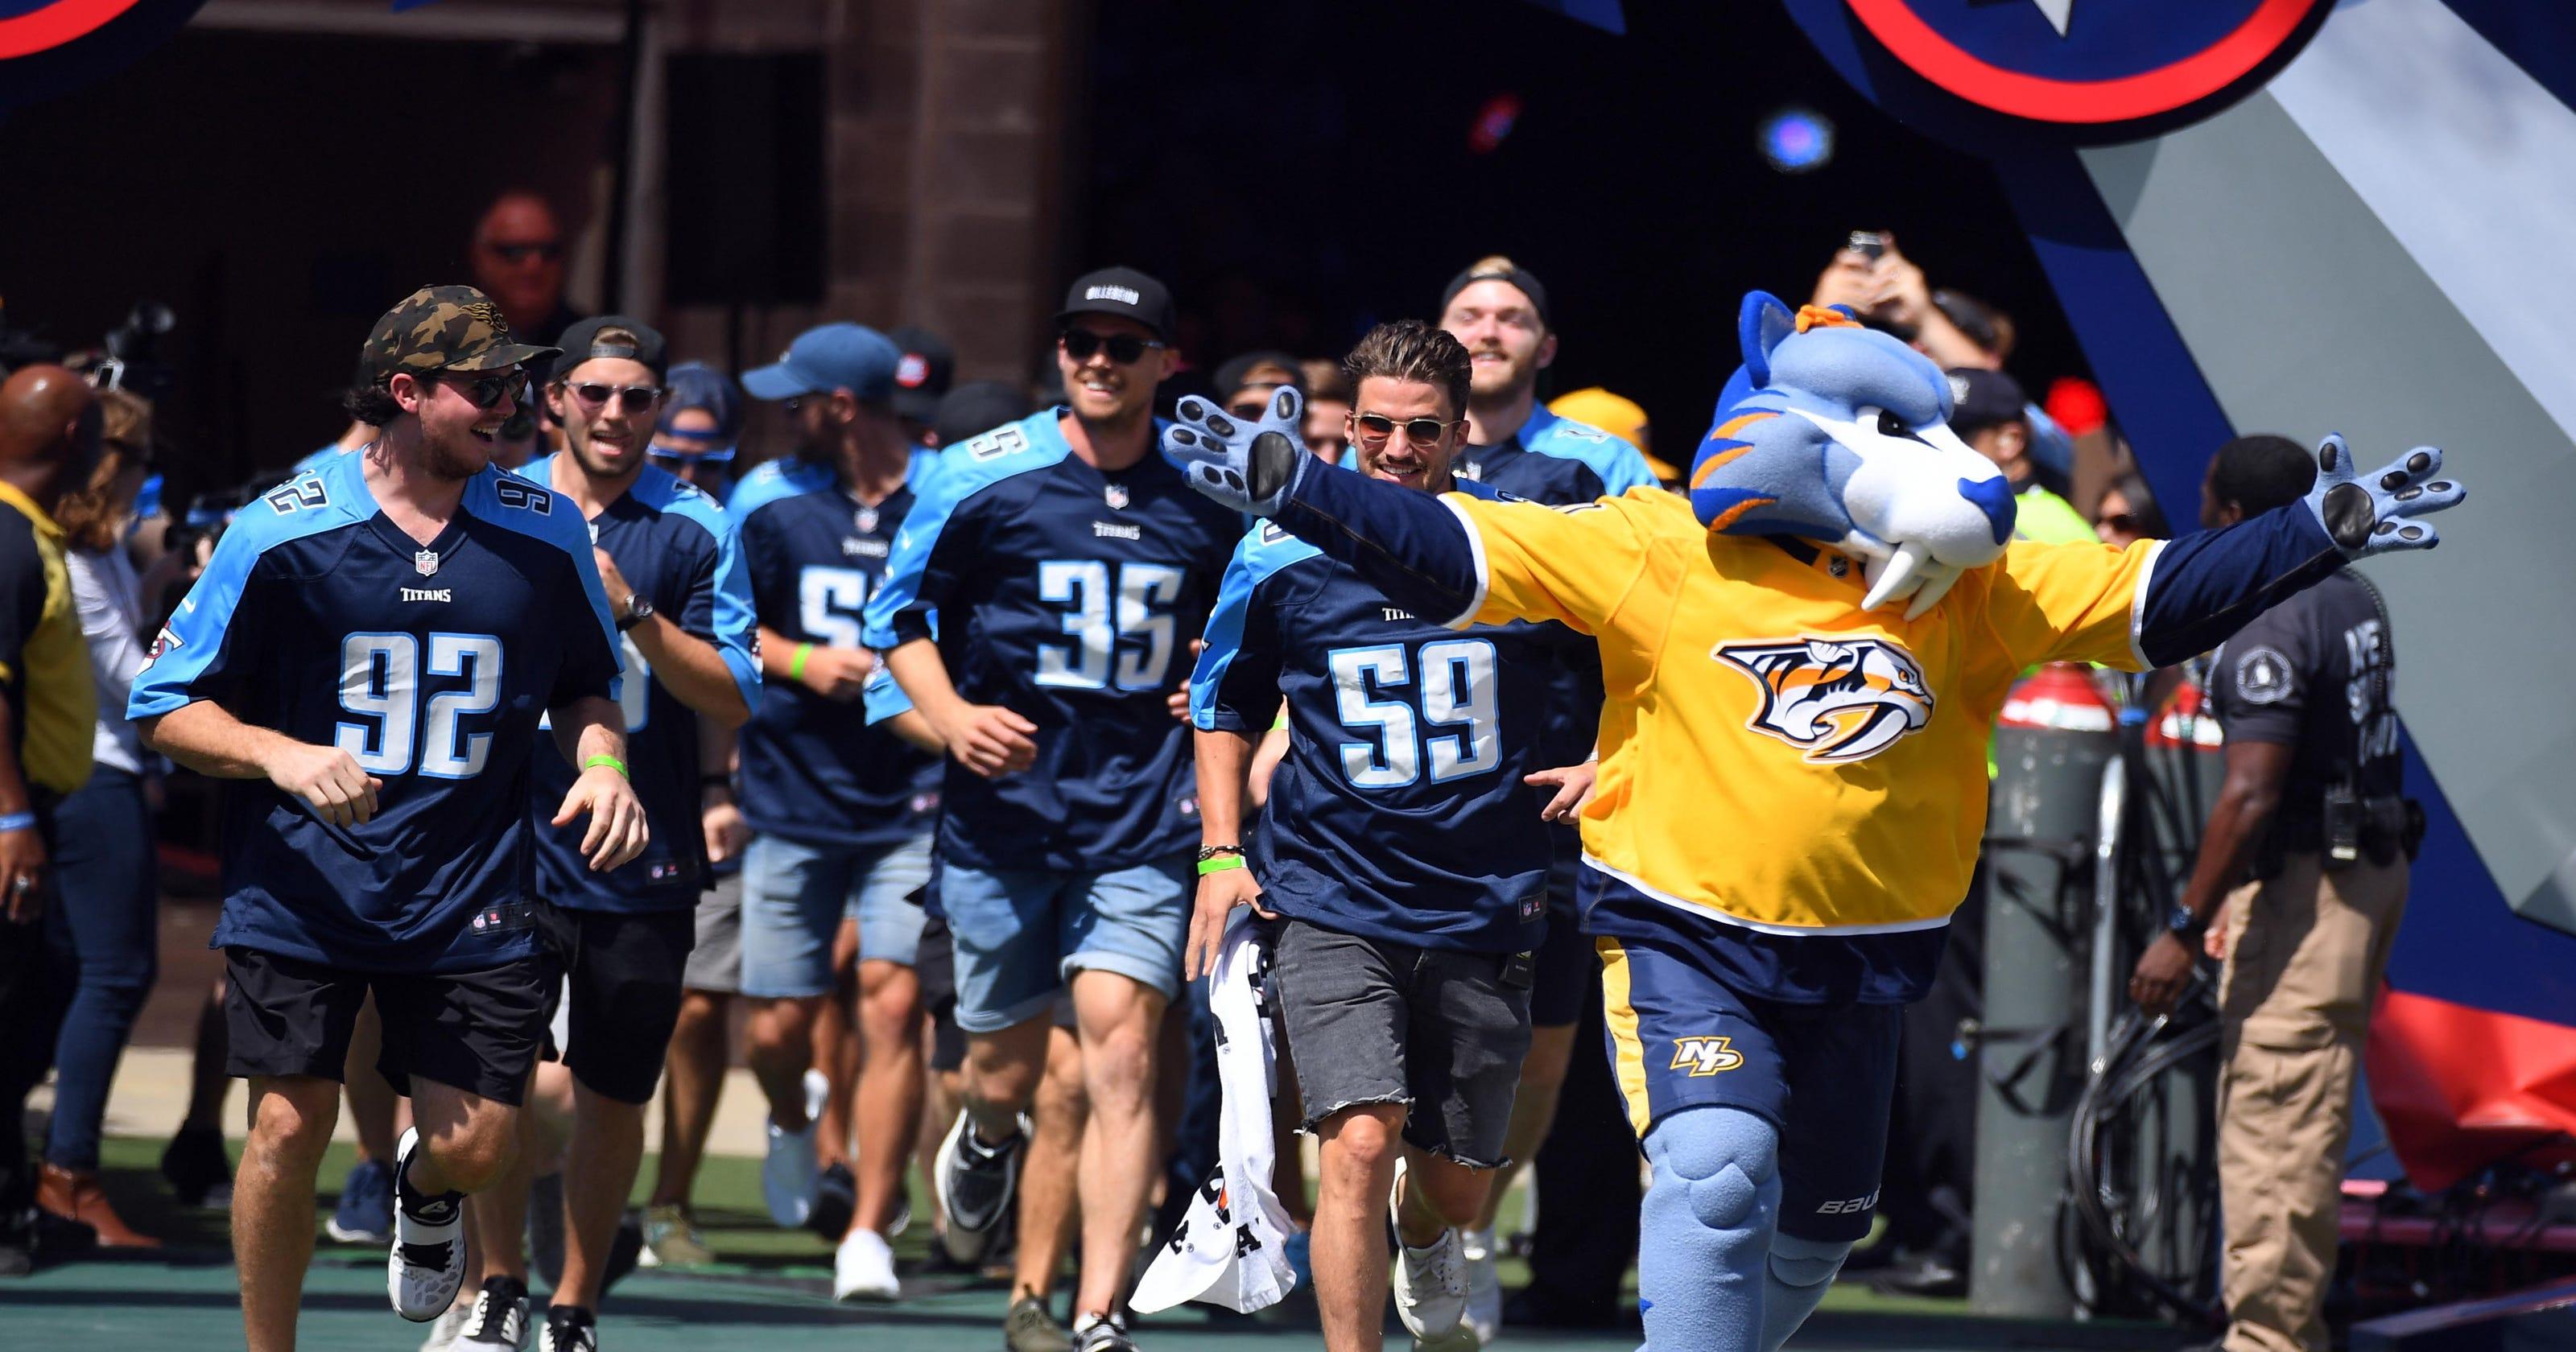 Will Predators cheer on Titans during 'Monday Night Football'?